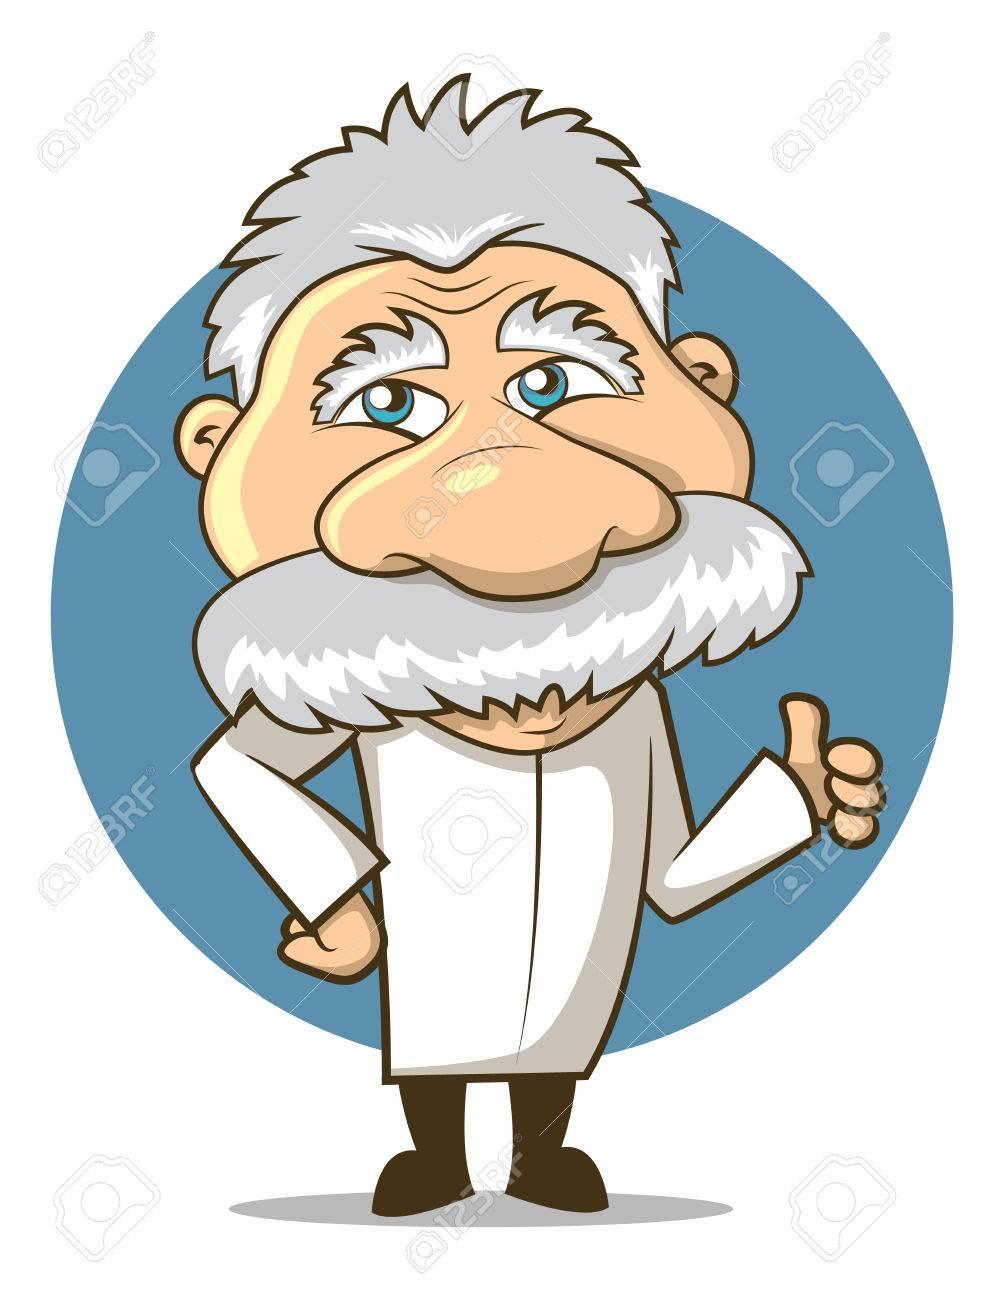 1004x1300 Einstein Cartoon Stock Photos. Royalty Free Business Images